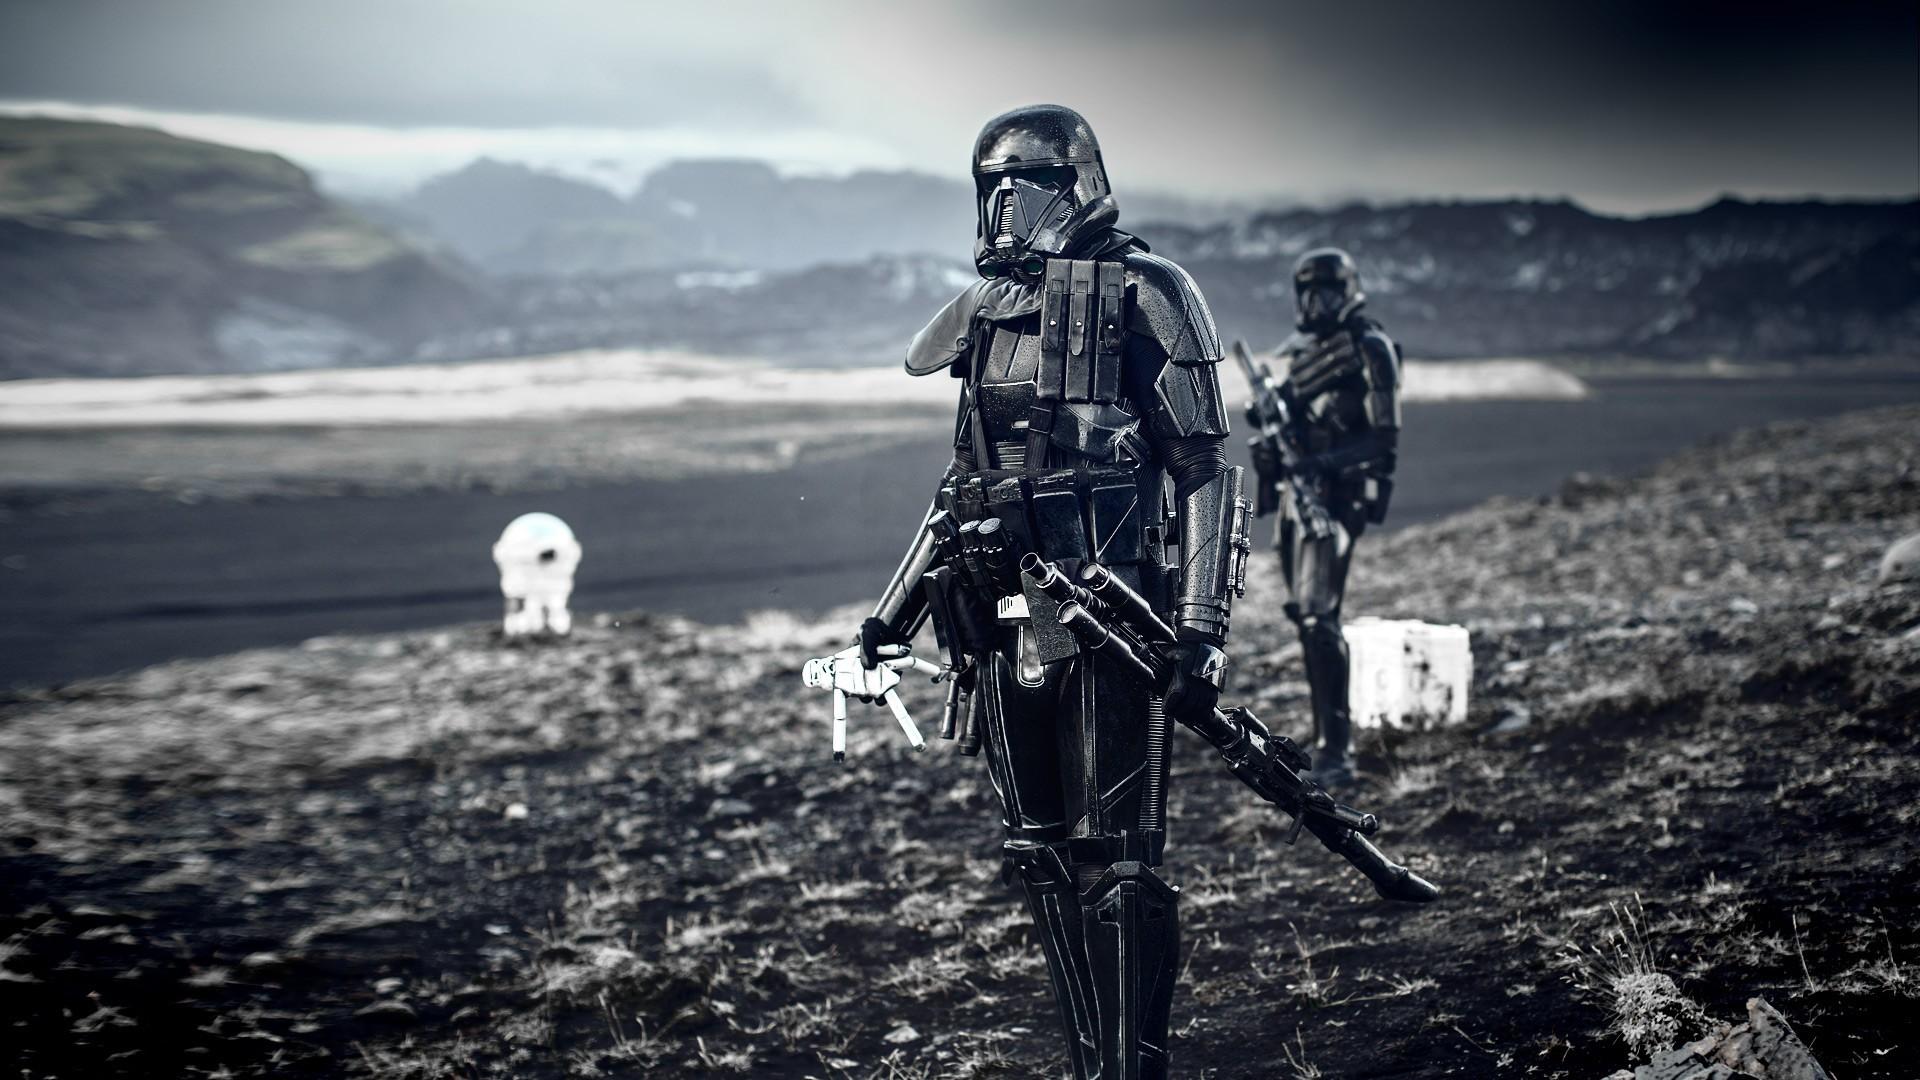 Star Wars 1080p Wallpaper (79+ images)